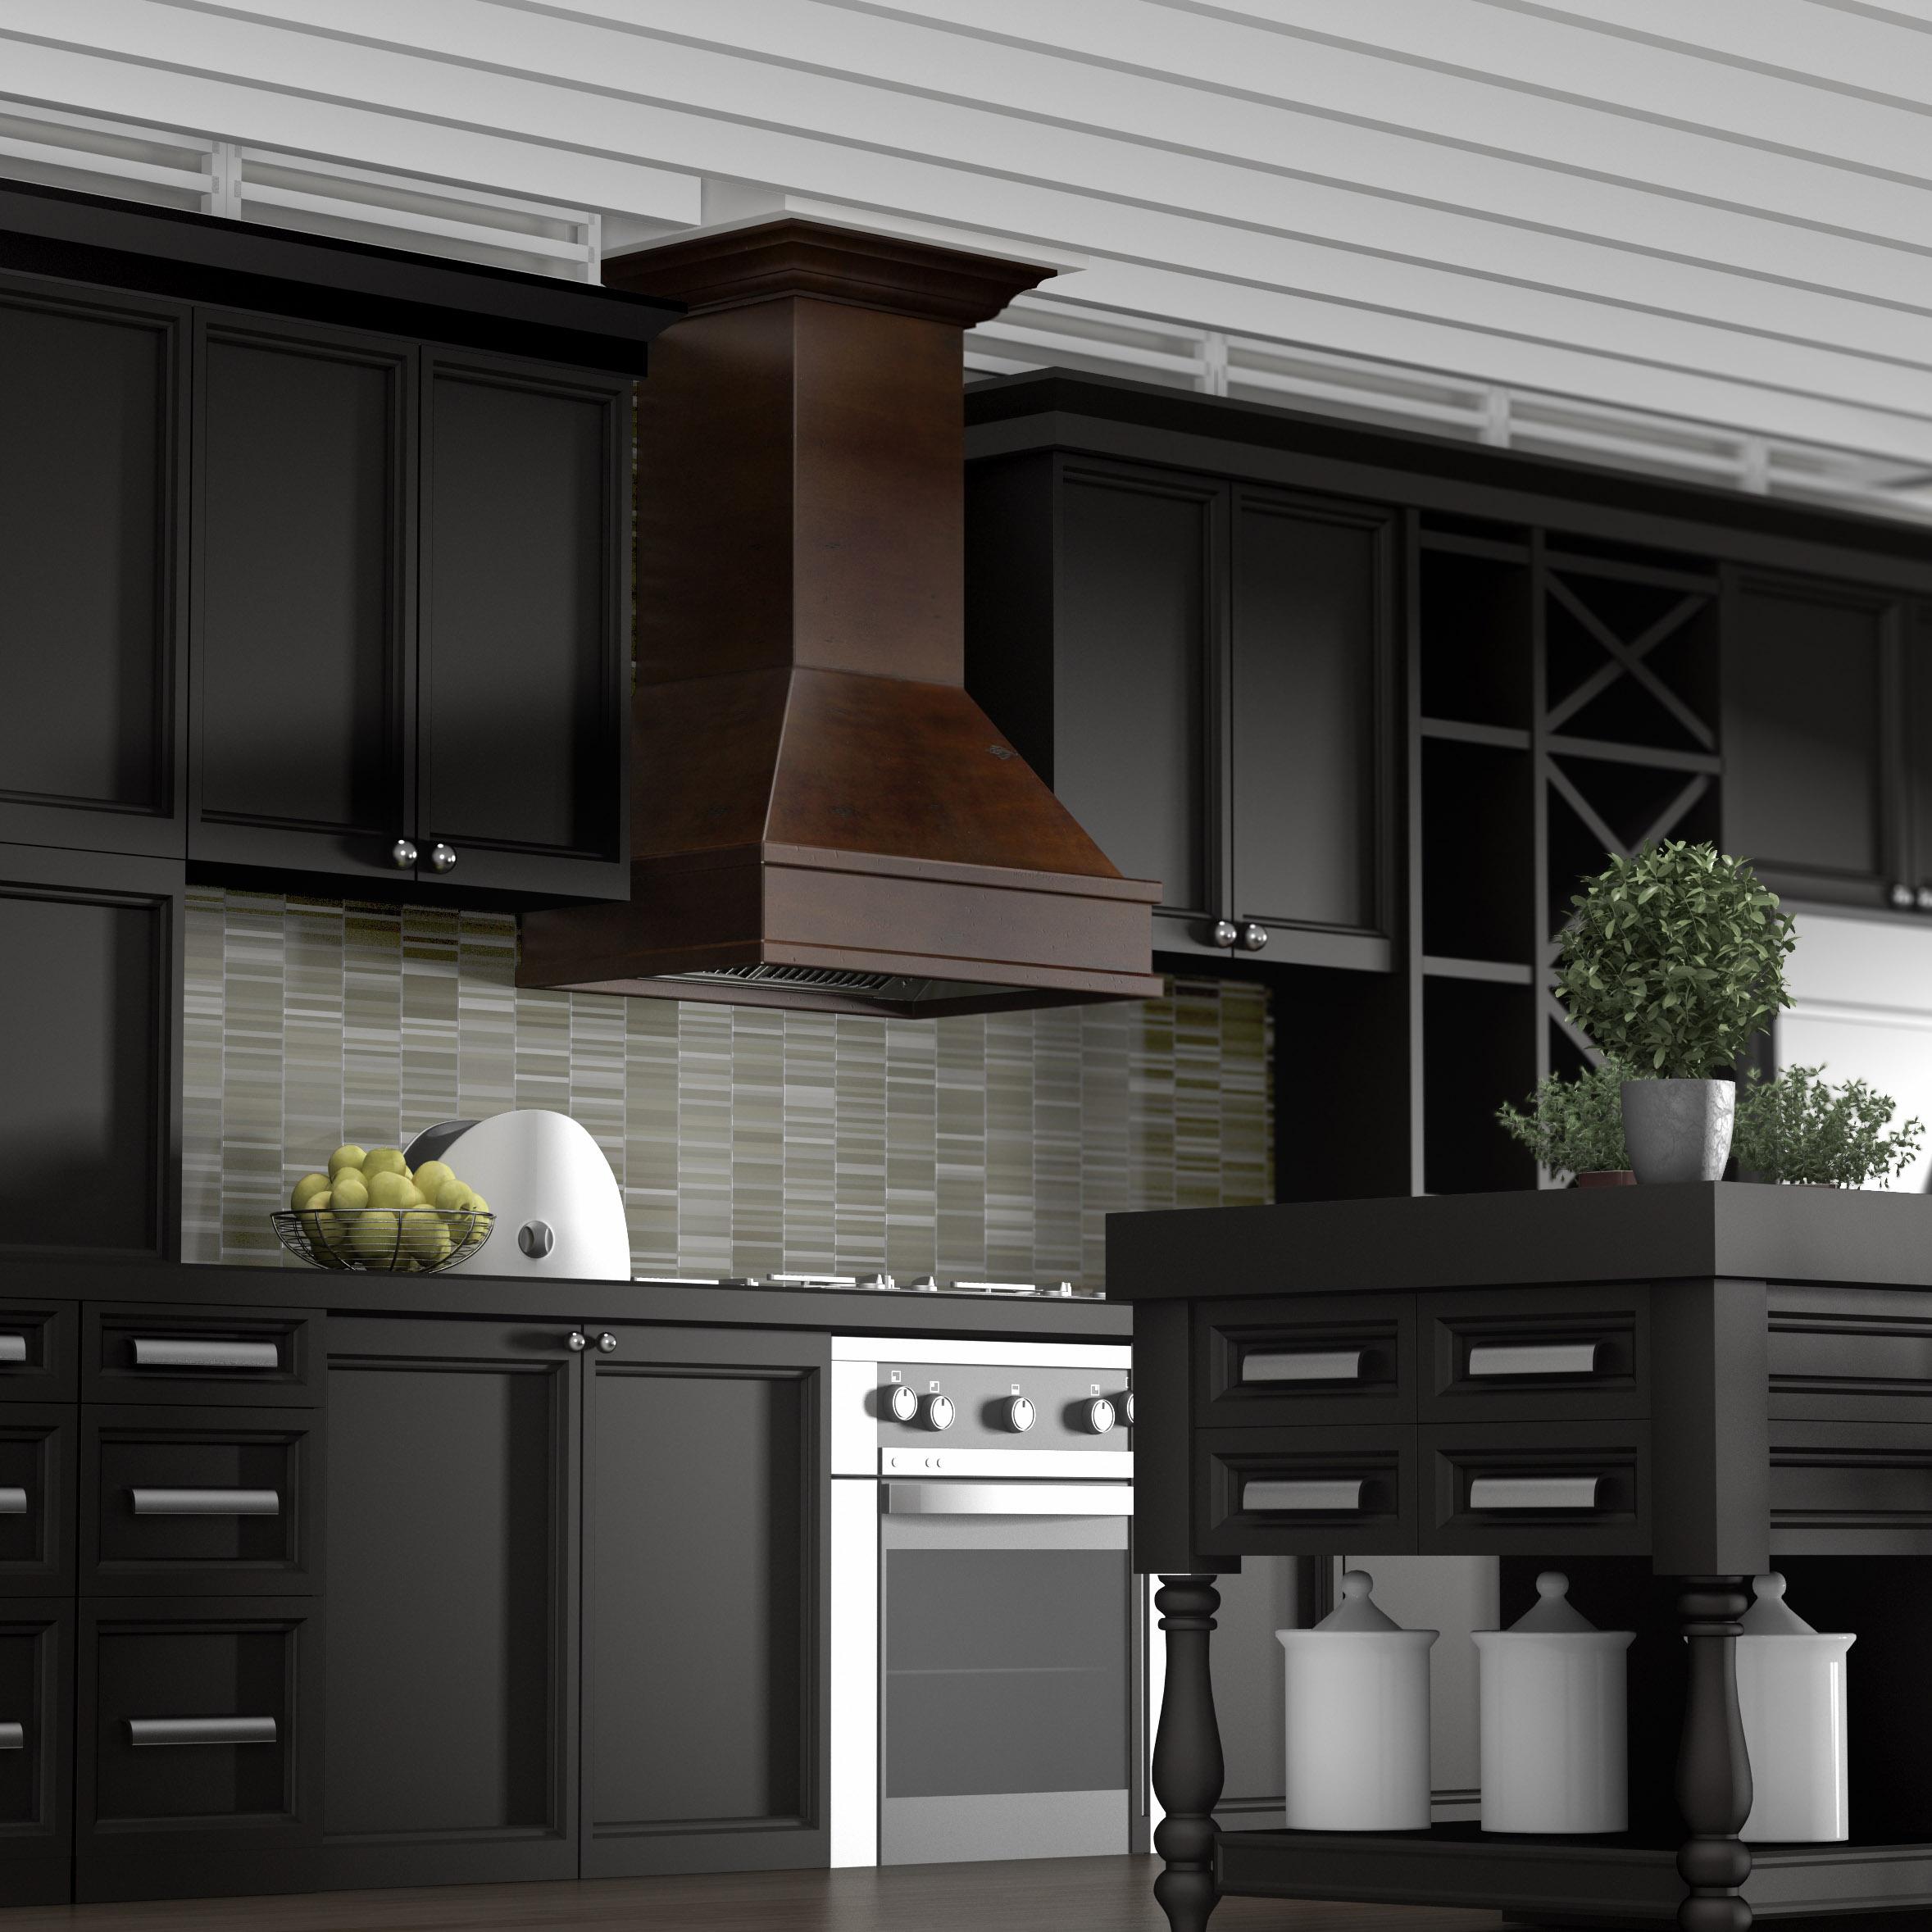 custom-wood-range-hood-zline-329WH-kitchen.jpg